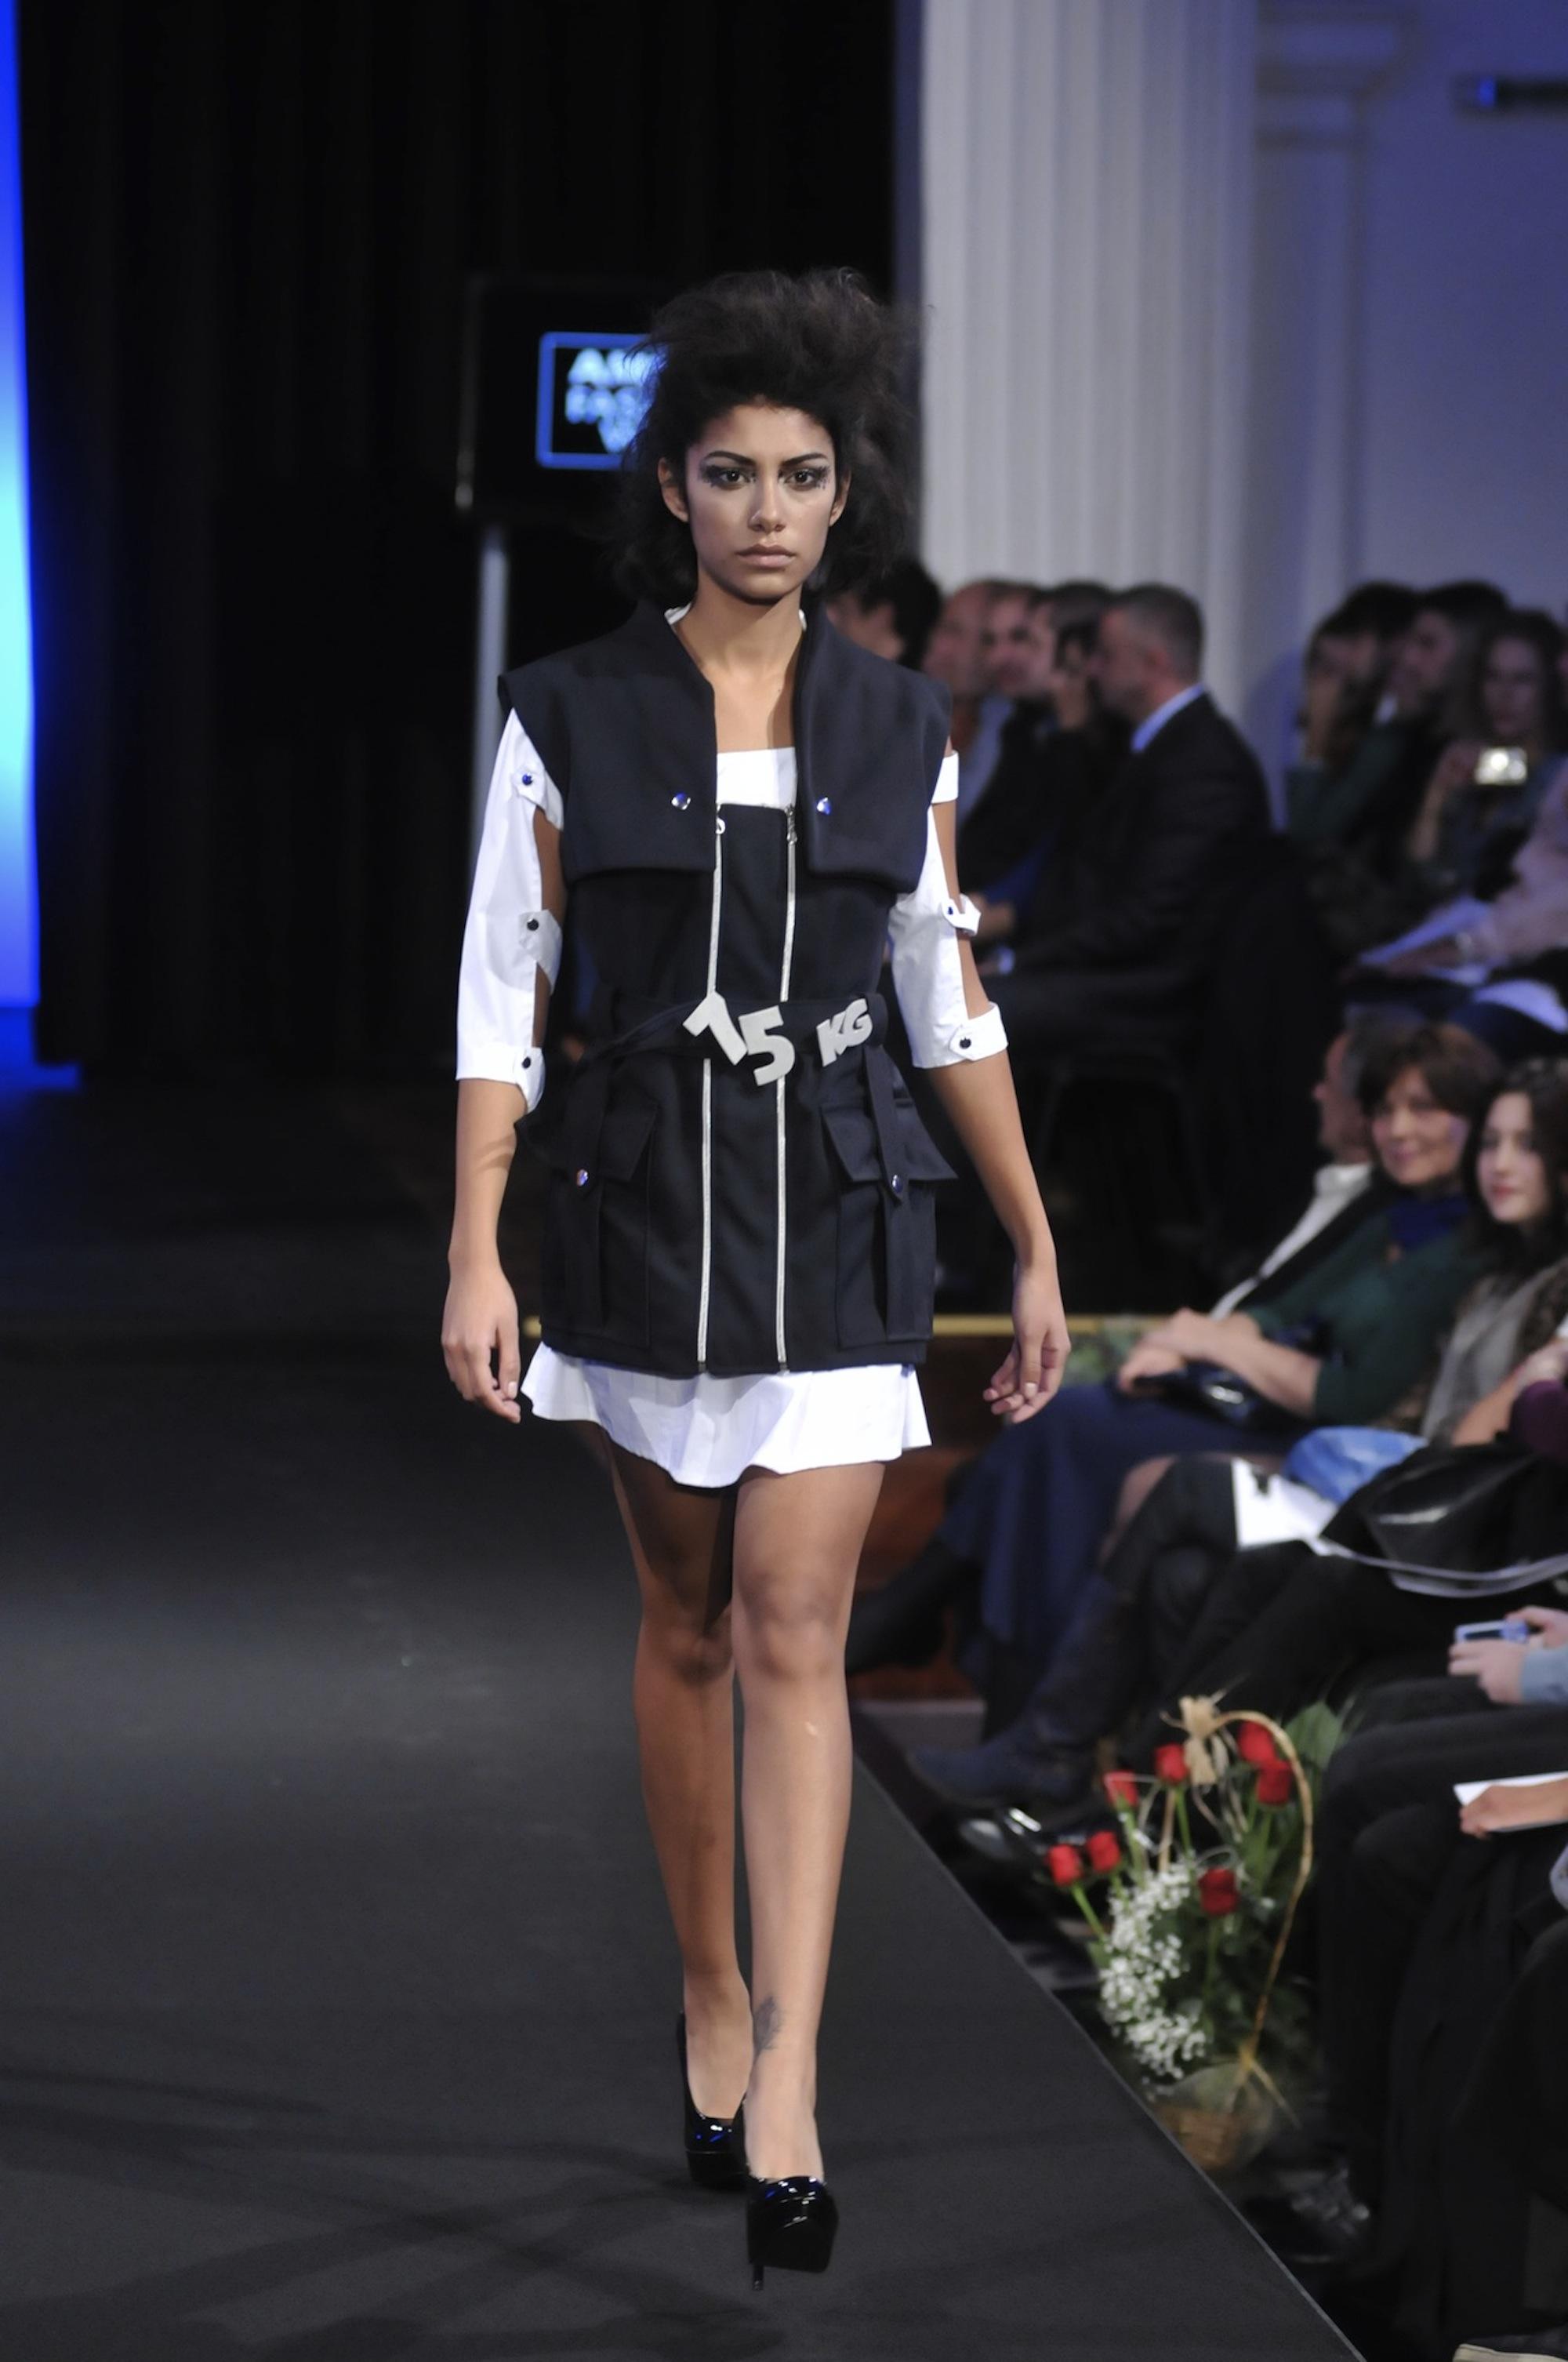 ivona miletic megatrend 30. Amstel Fashion Week: 2. veče